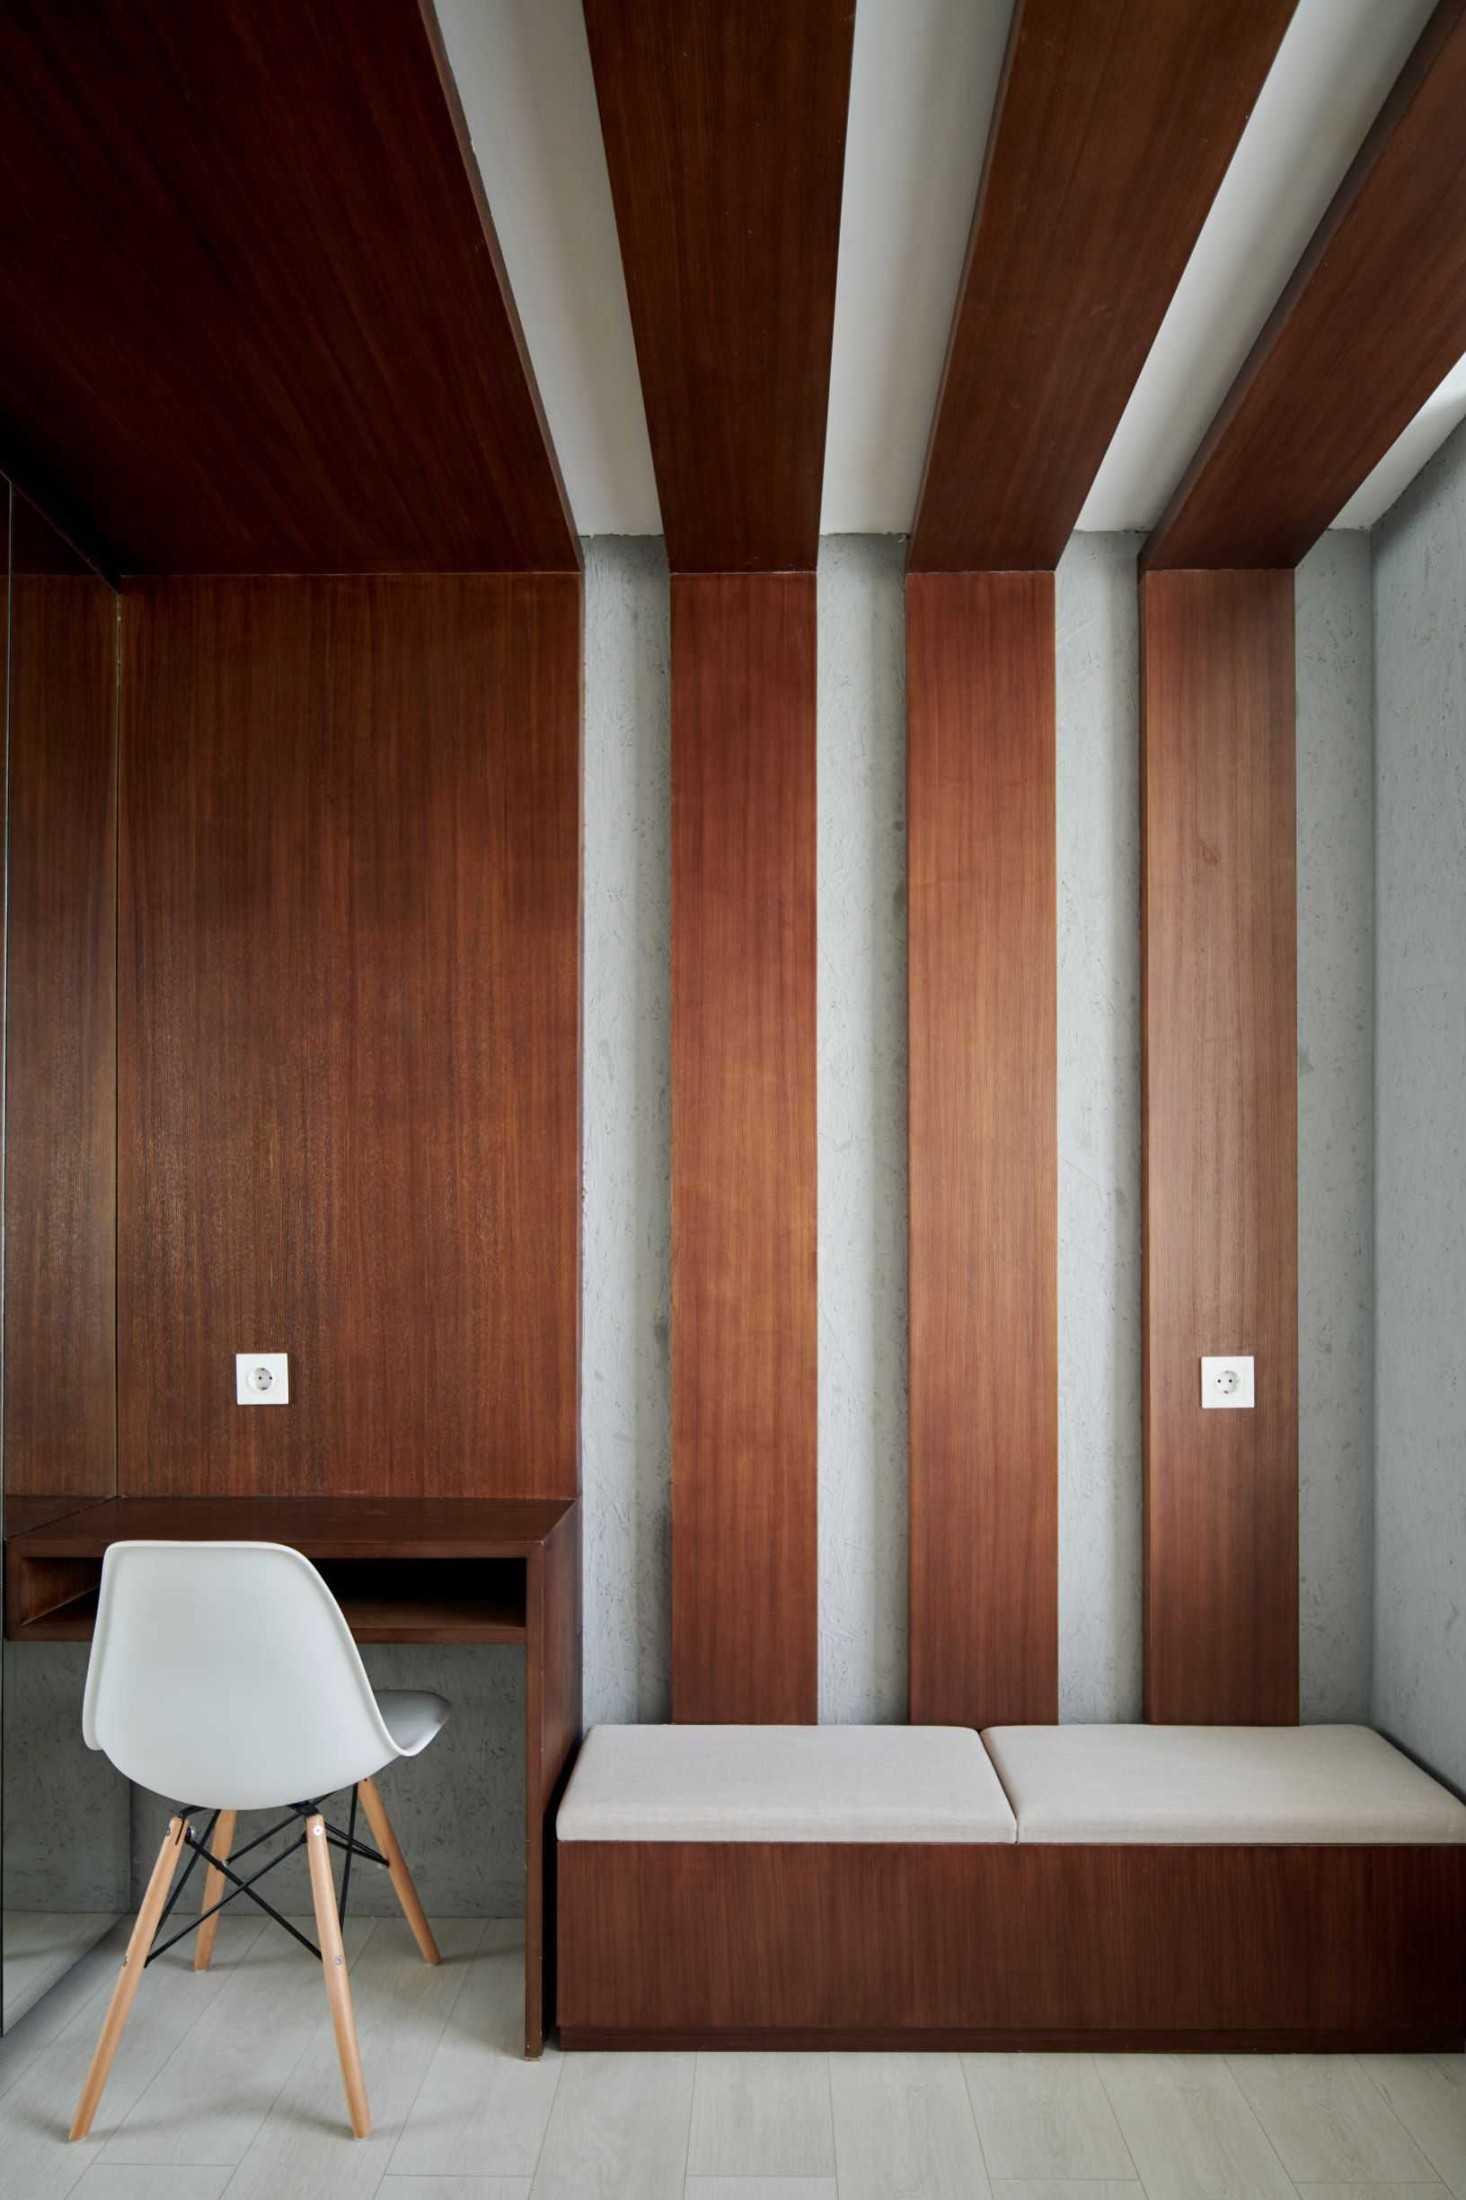 Hadivincent Architects Tb Apartment Lippo Cikarang, Bekasi, Jawa Barat, Indonesia Lippo Cikarang, Bekasi, Jawa Barat, Indonesia Hadi-Vincent-Architects-Tb-Apartment  71003